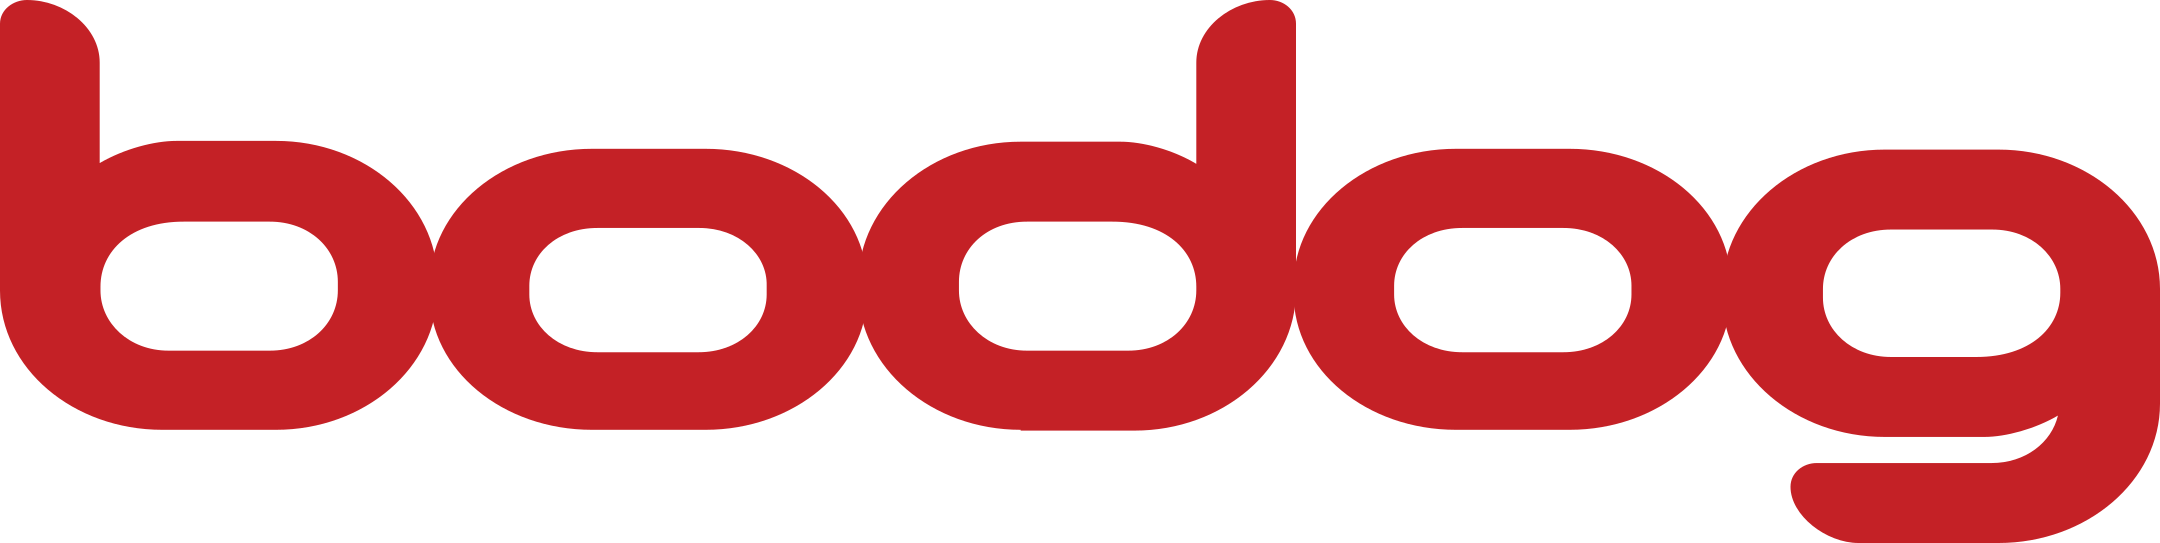 bodog logo 1 - Bodog Logo